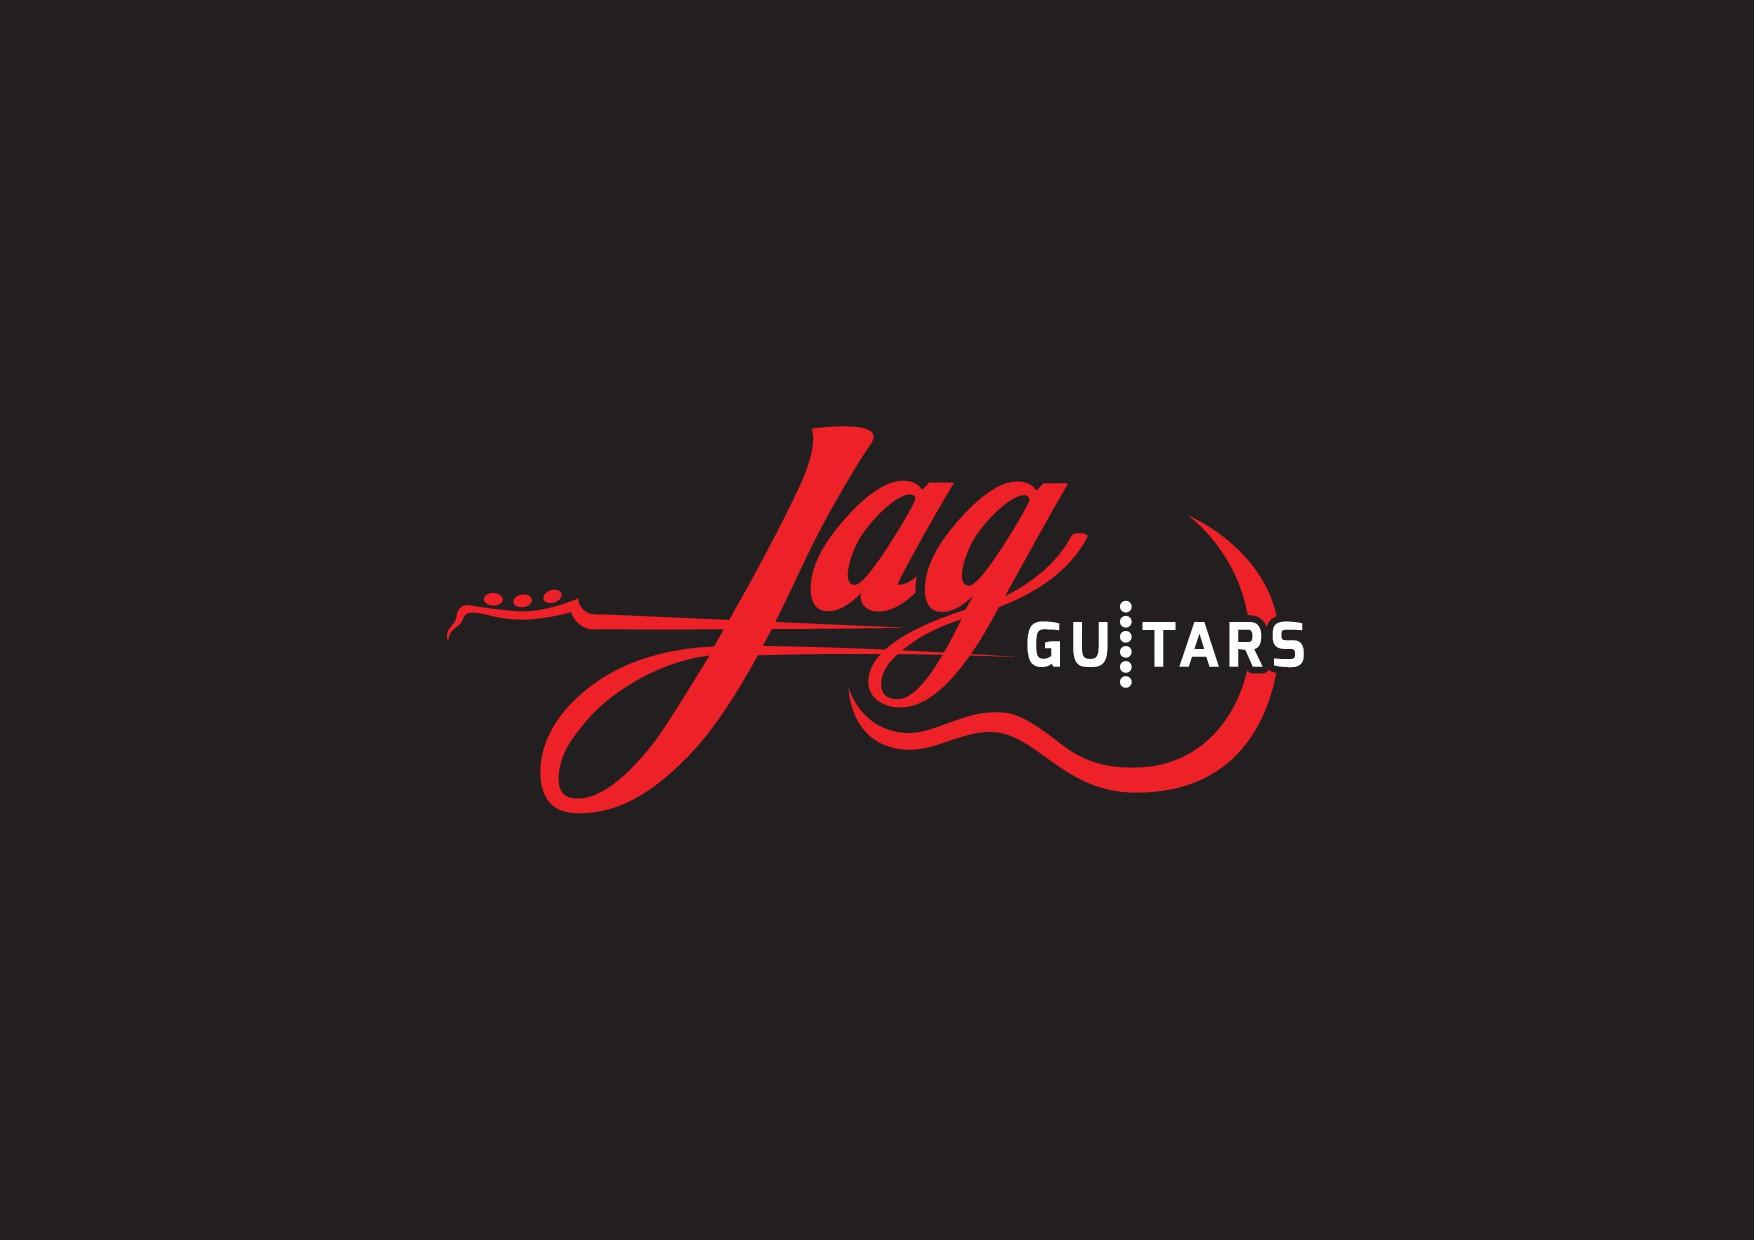 JAG Guitars/Pickups logo design,